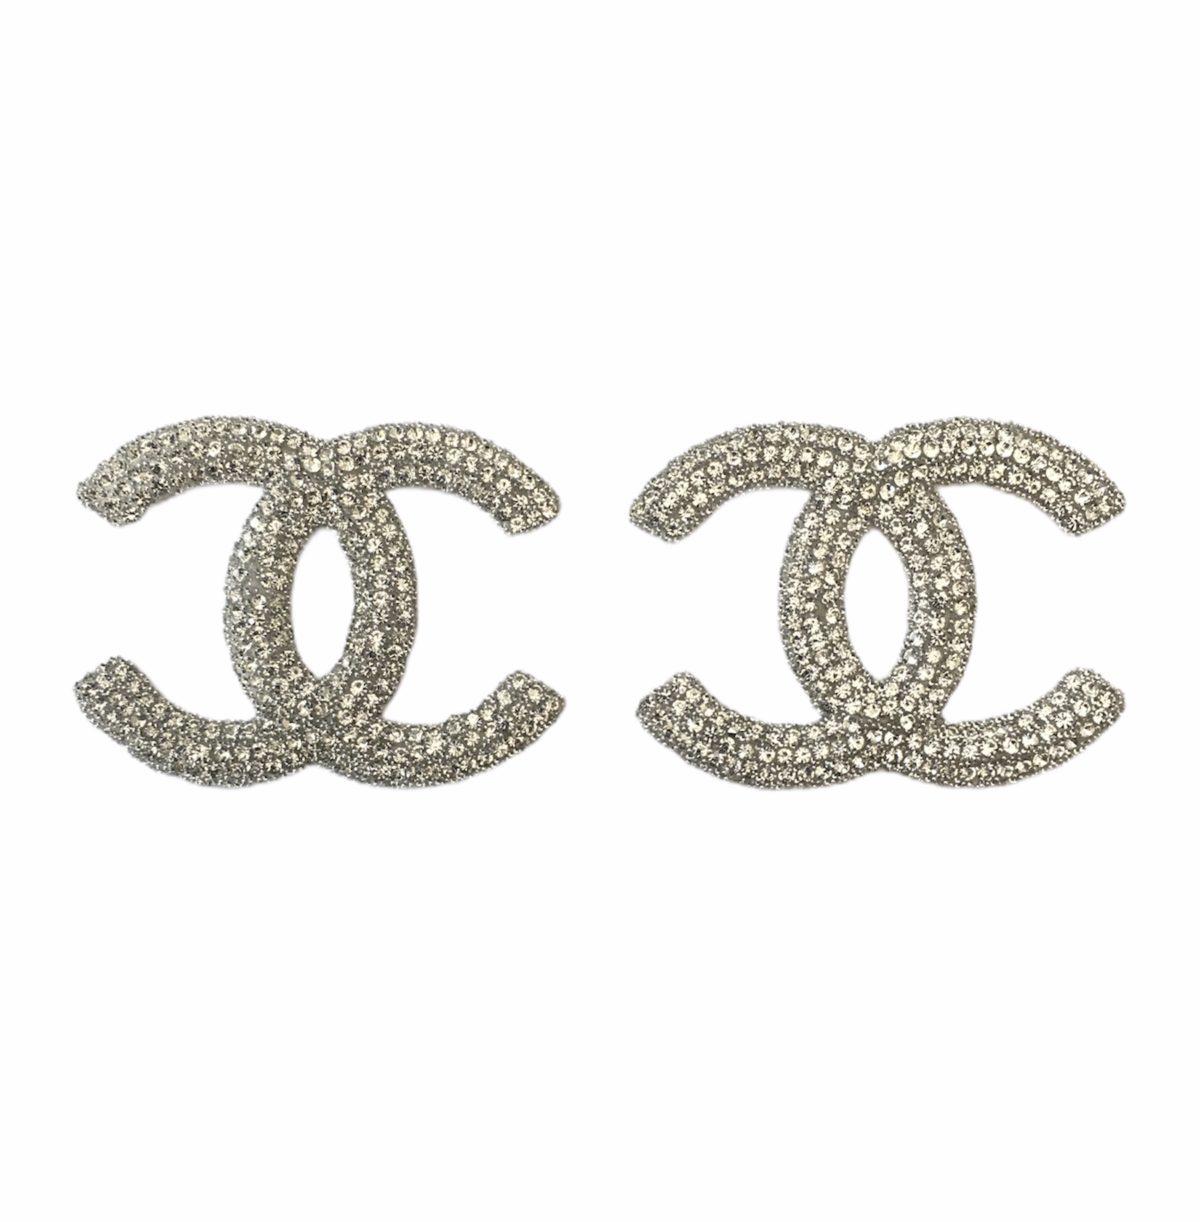 New Chanel Rhinestone Iron on Emblem Patch 2